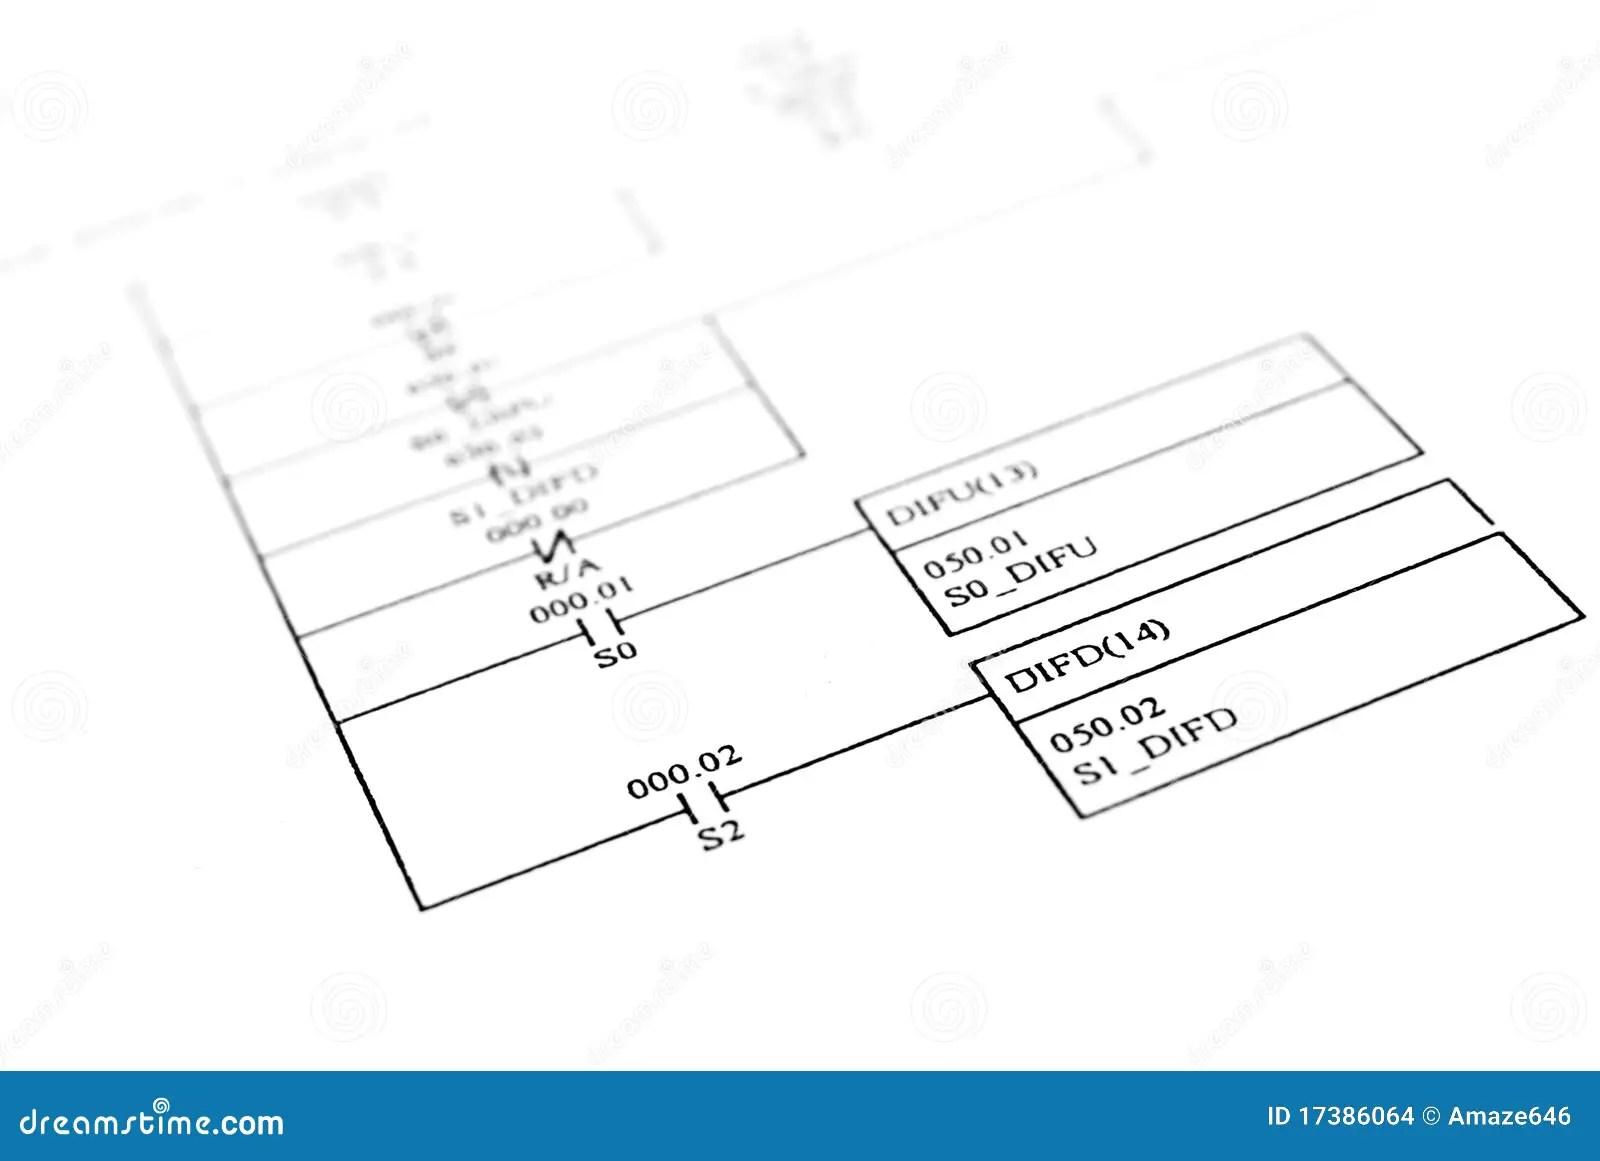 Schematic diagram stock photo. Image of schematic